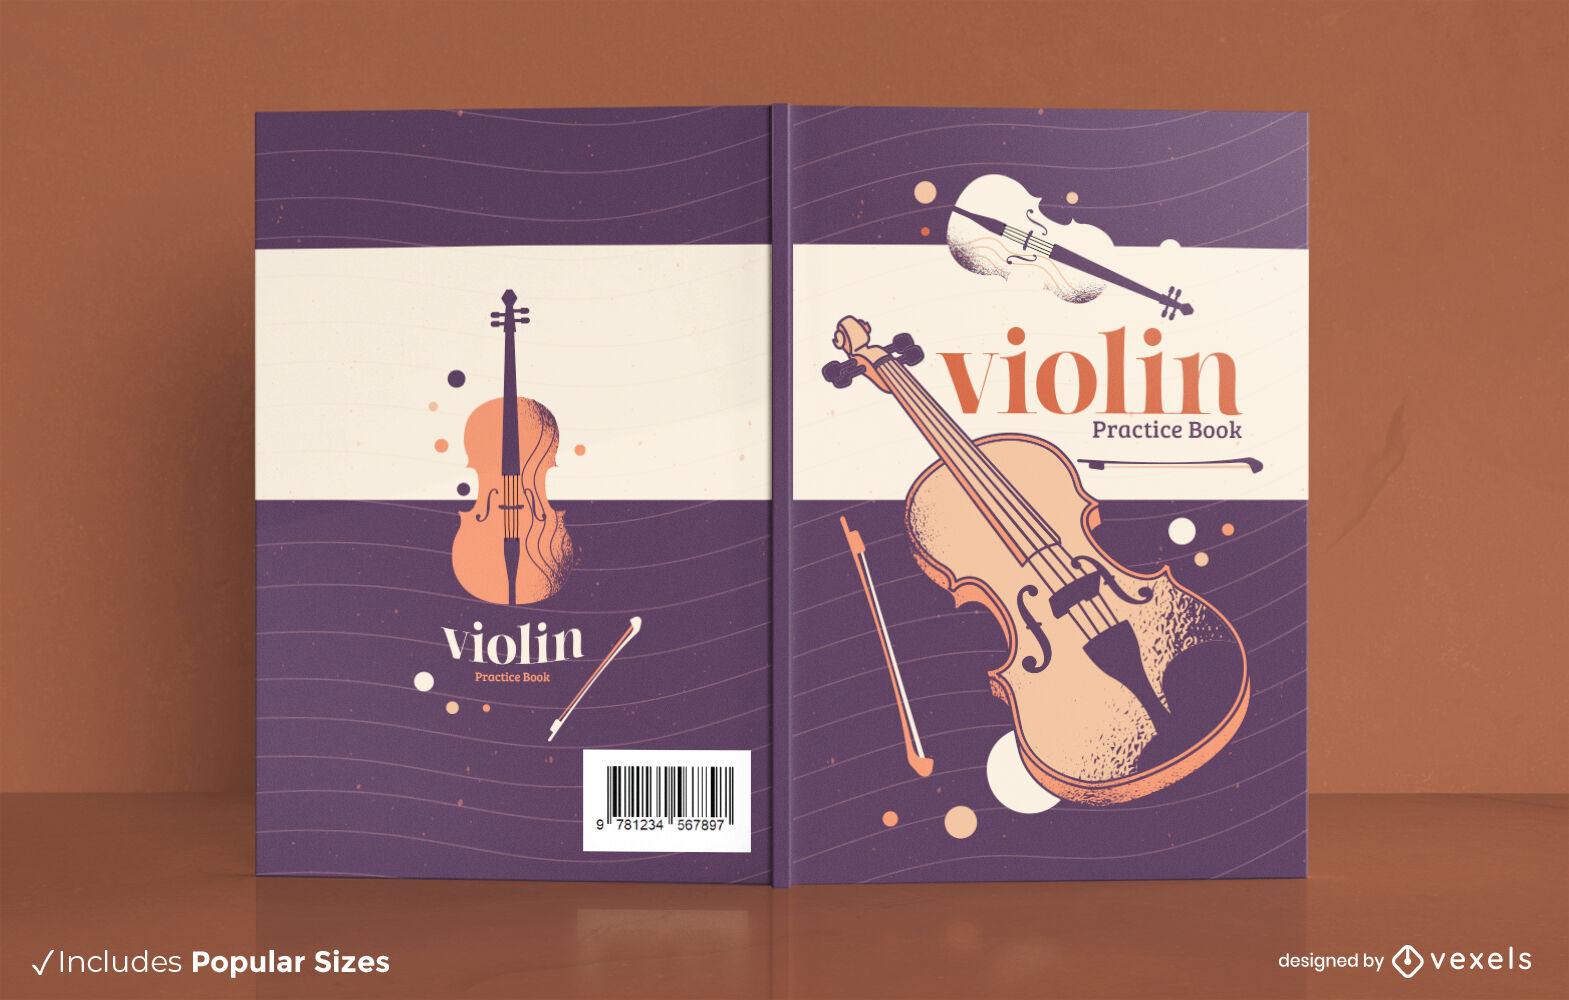 Violin music instrument book cover design